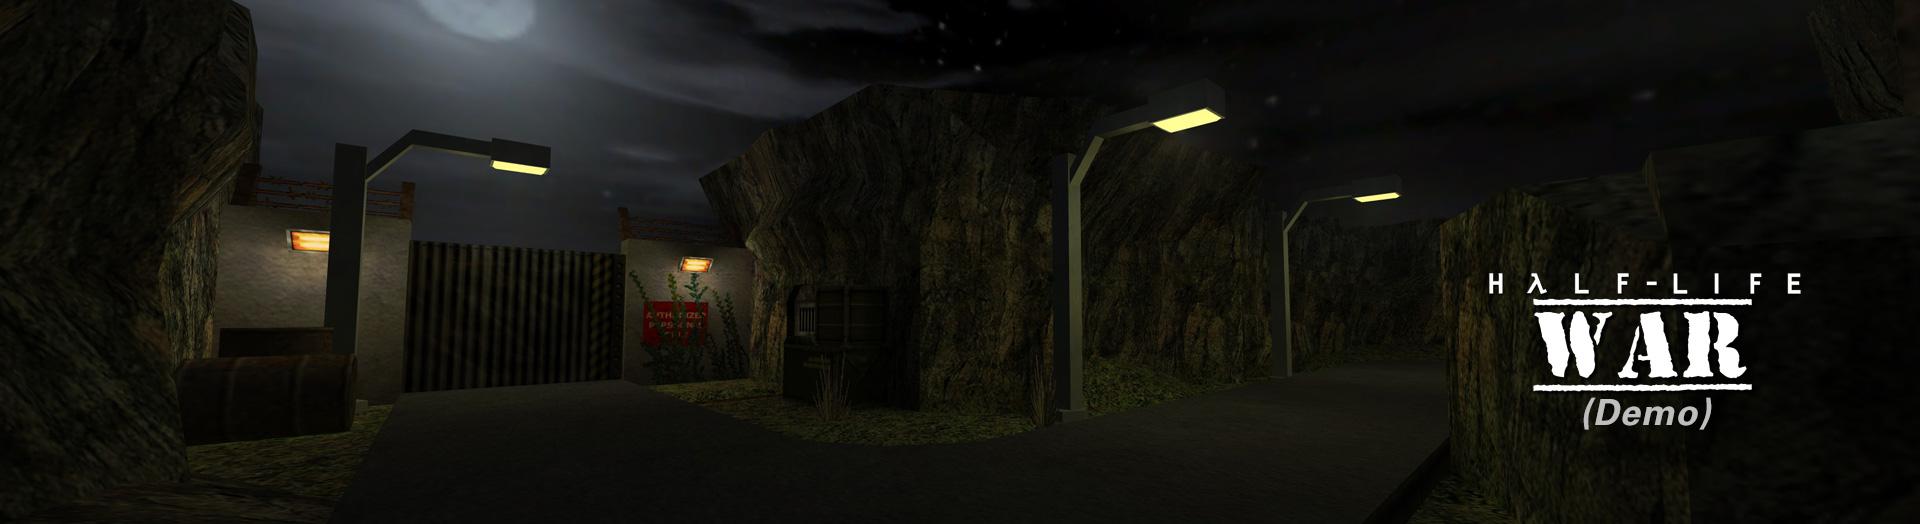 Half-Life: WAR (Demo)